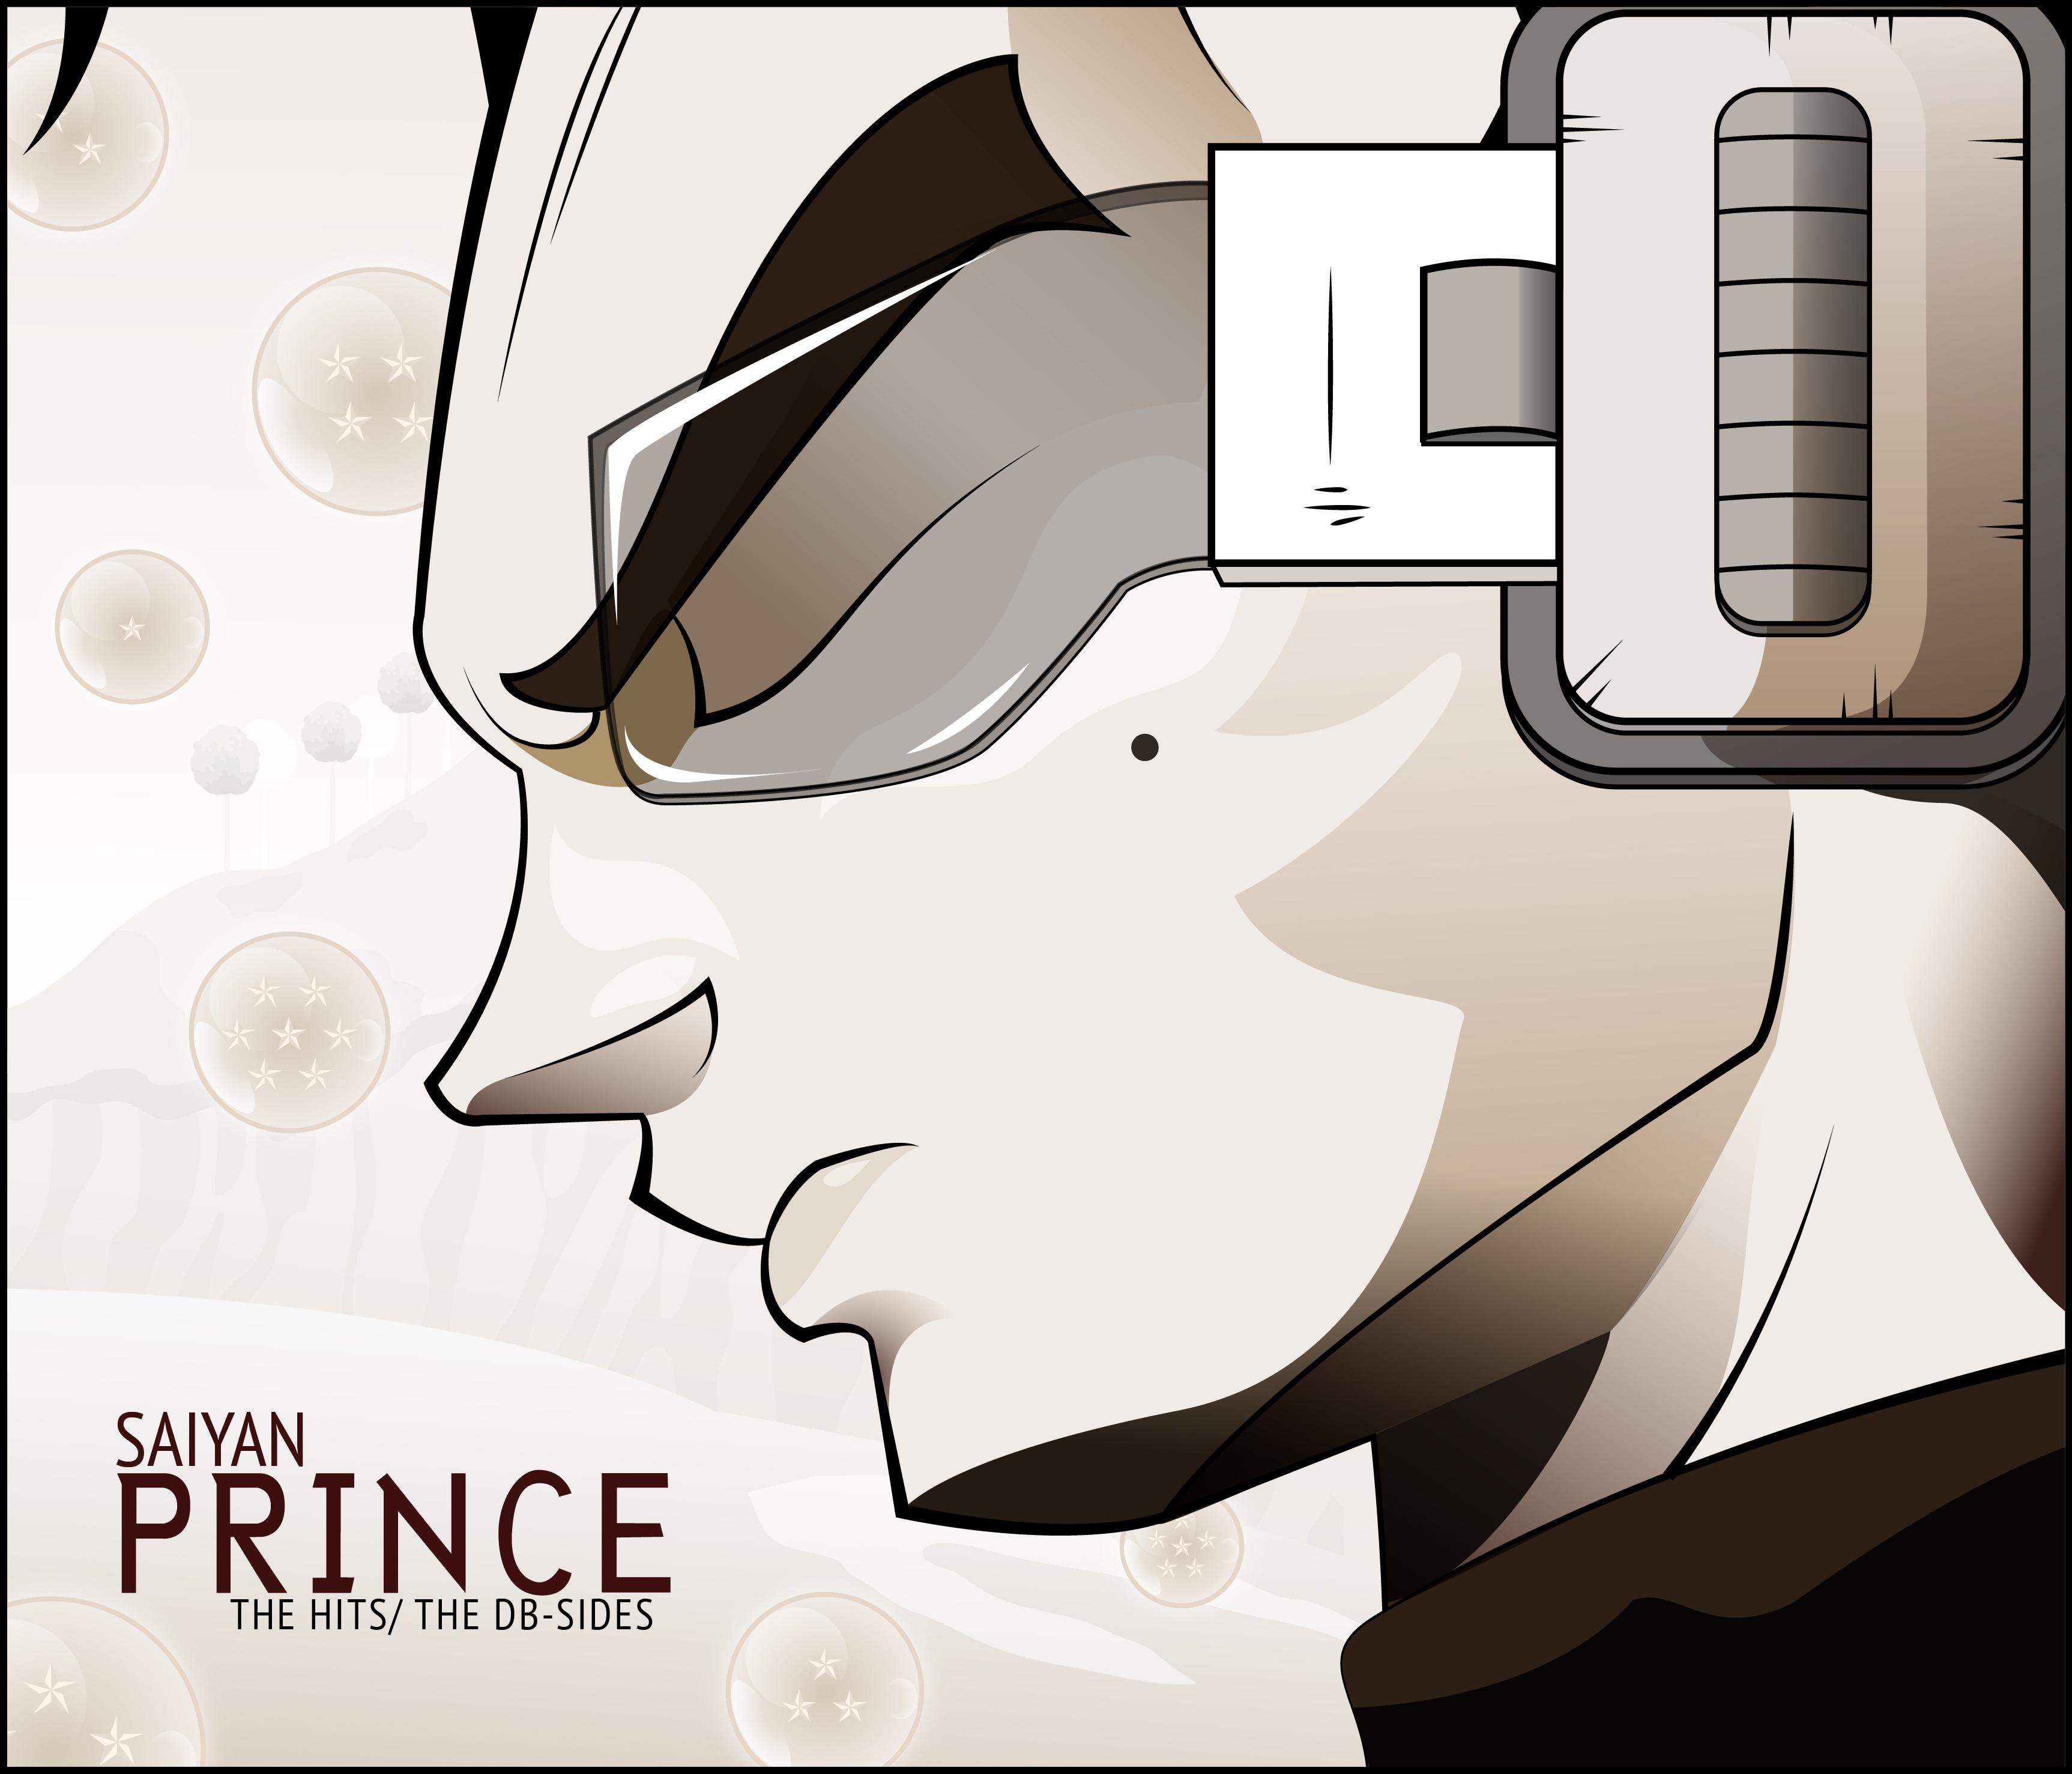 Saiyan Prince: The Hits/ The DB Sides - Taran Lopez